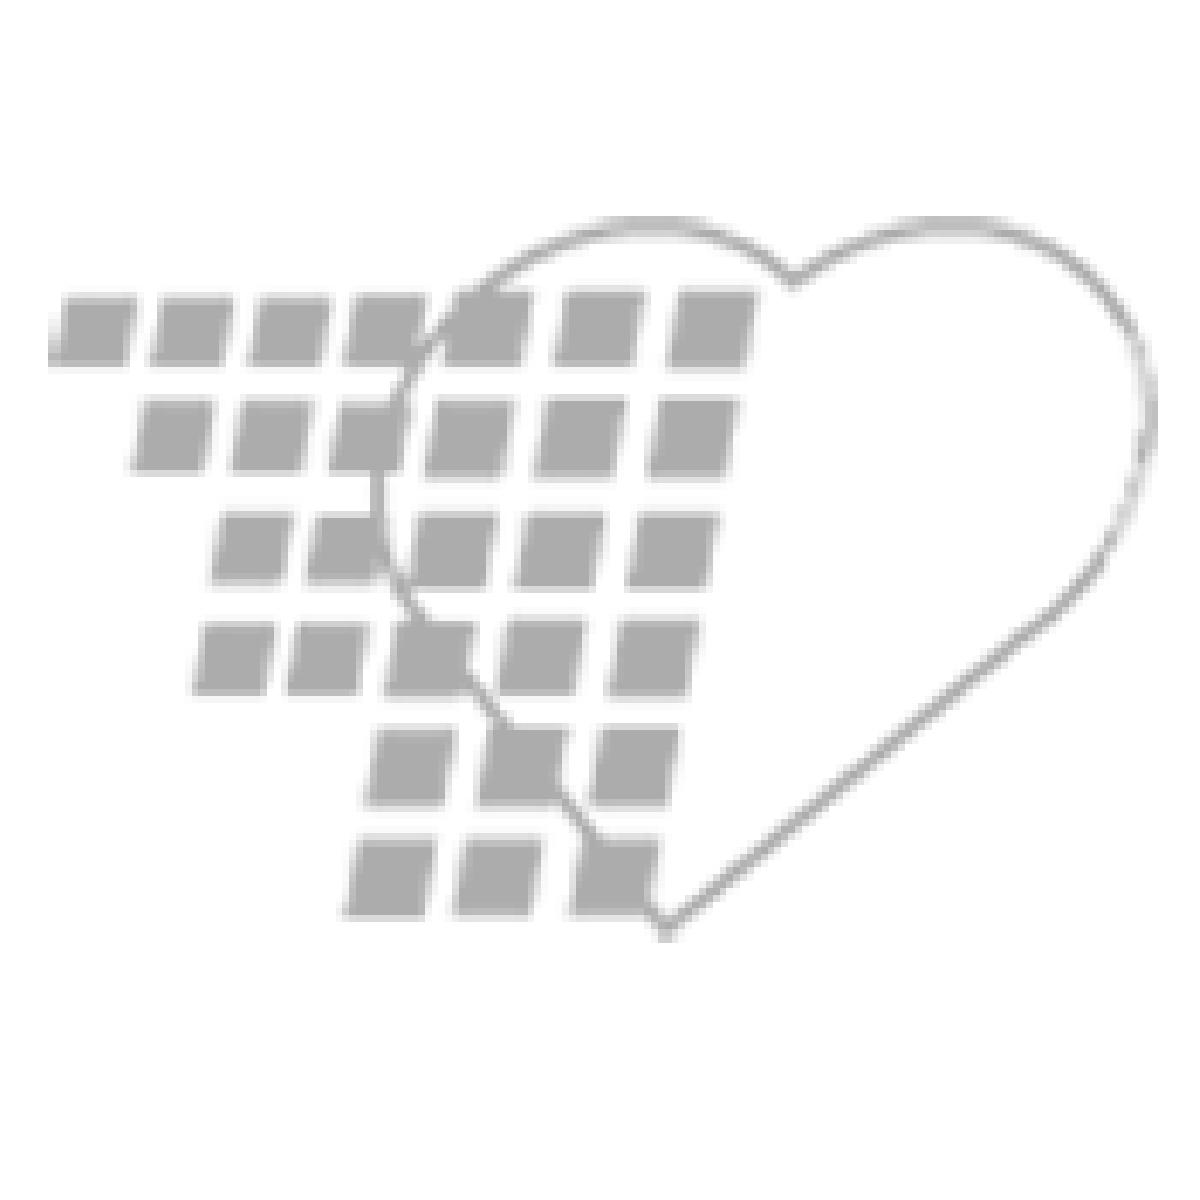 02-19-0272  hCG Combo Test